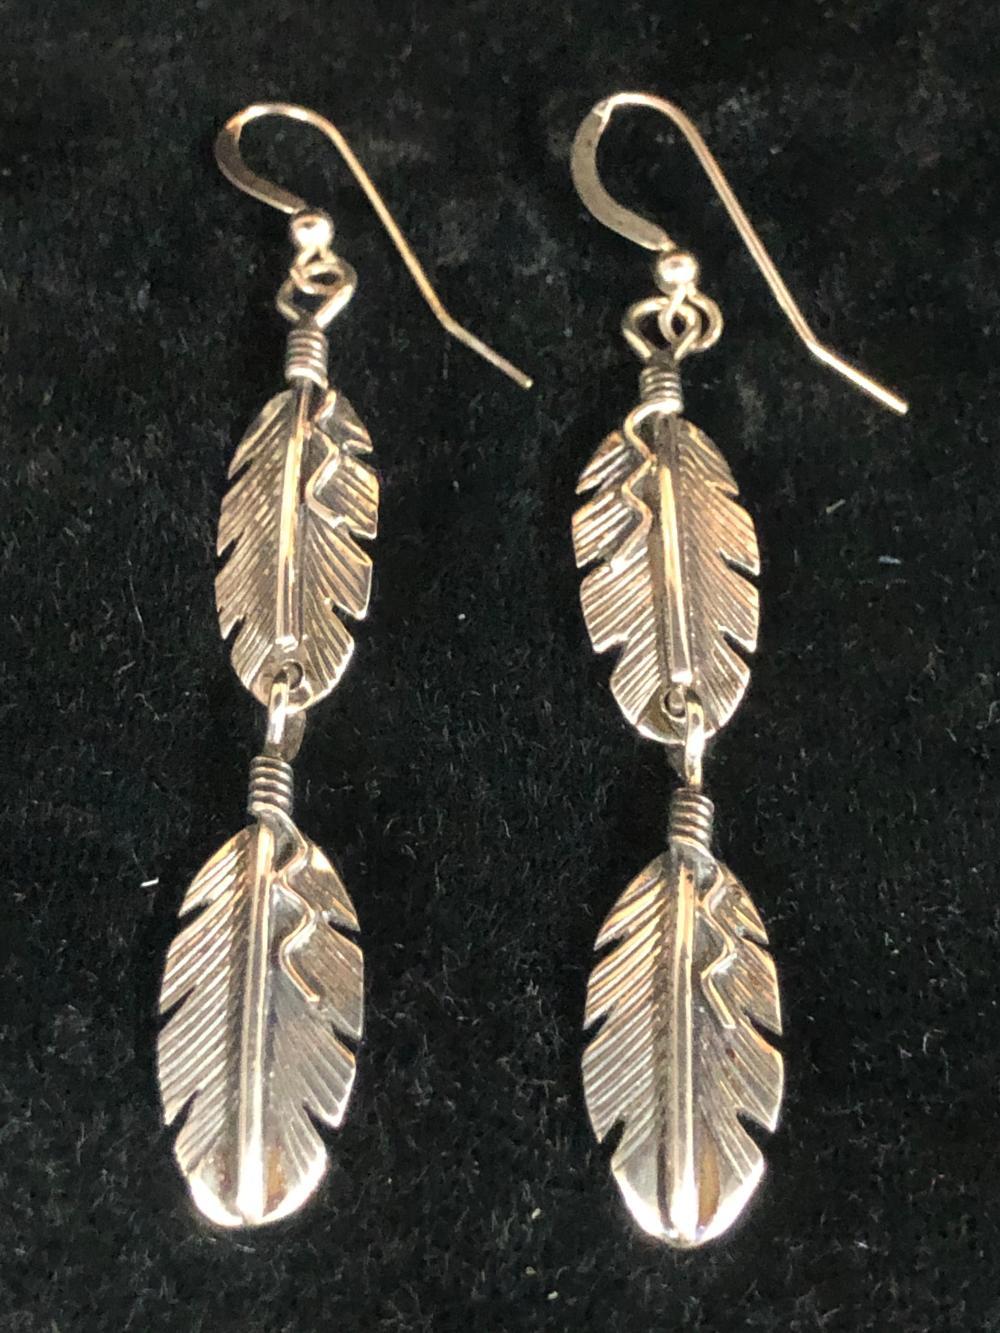 Double feather sterling silver earrings